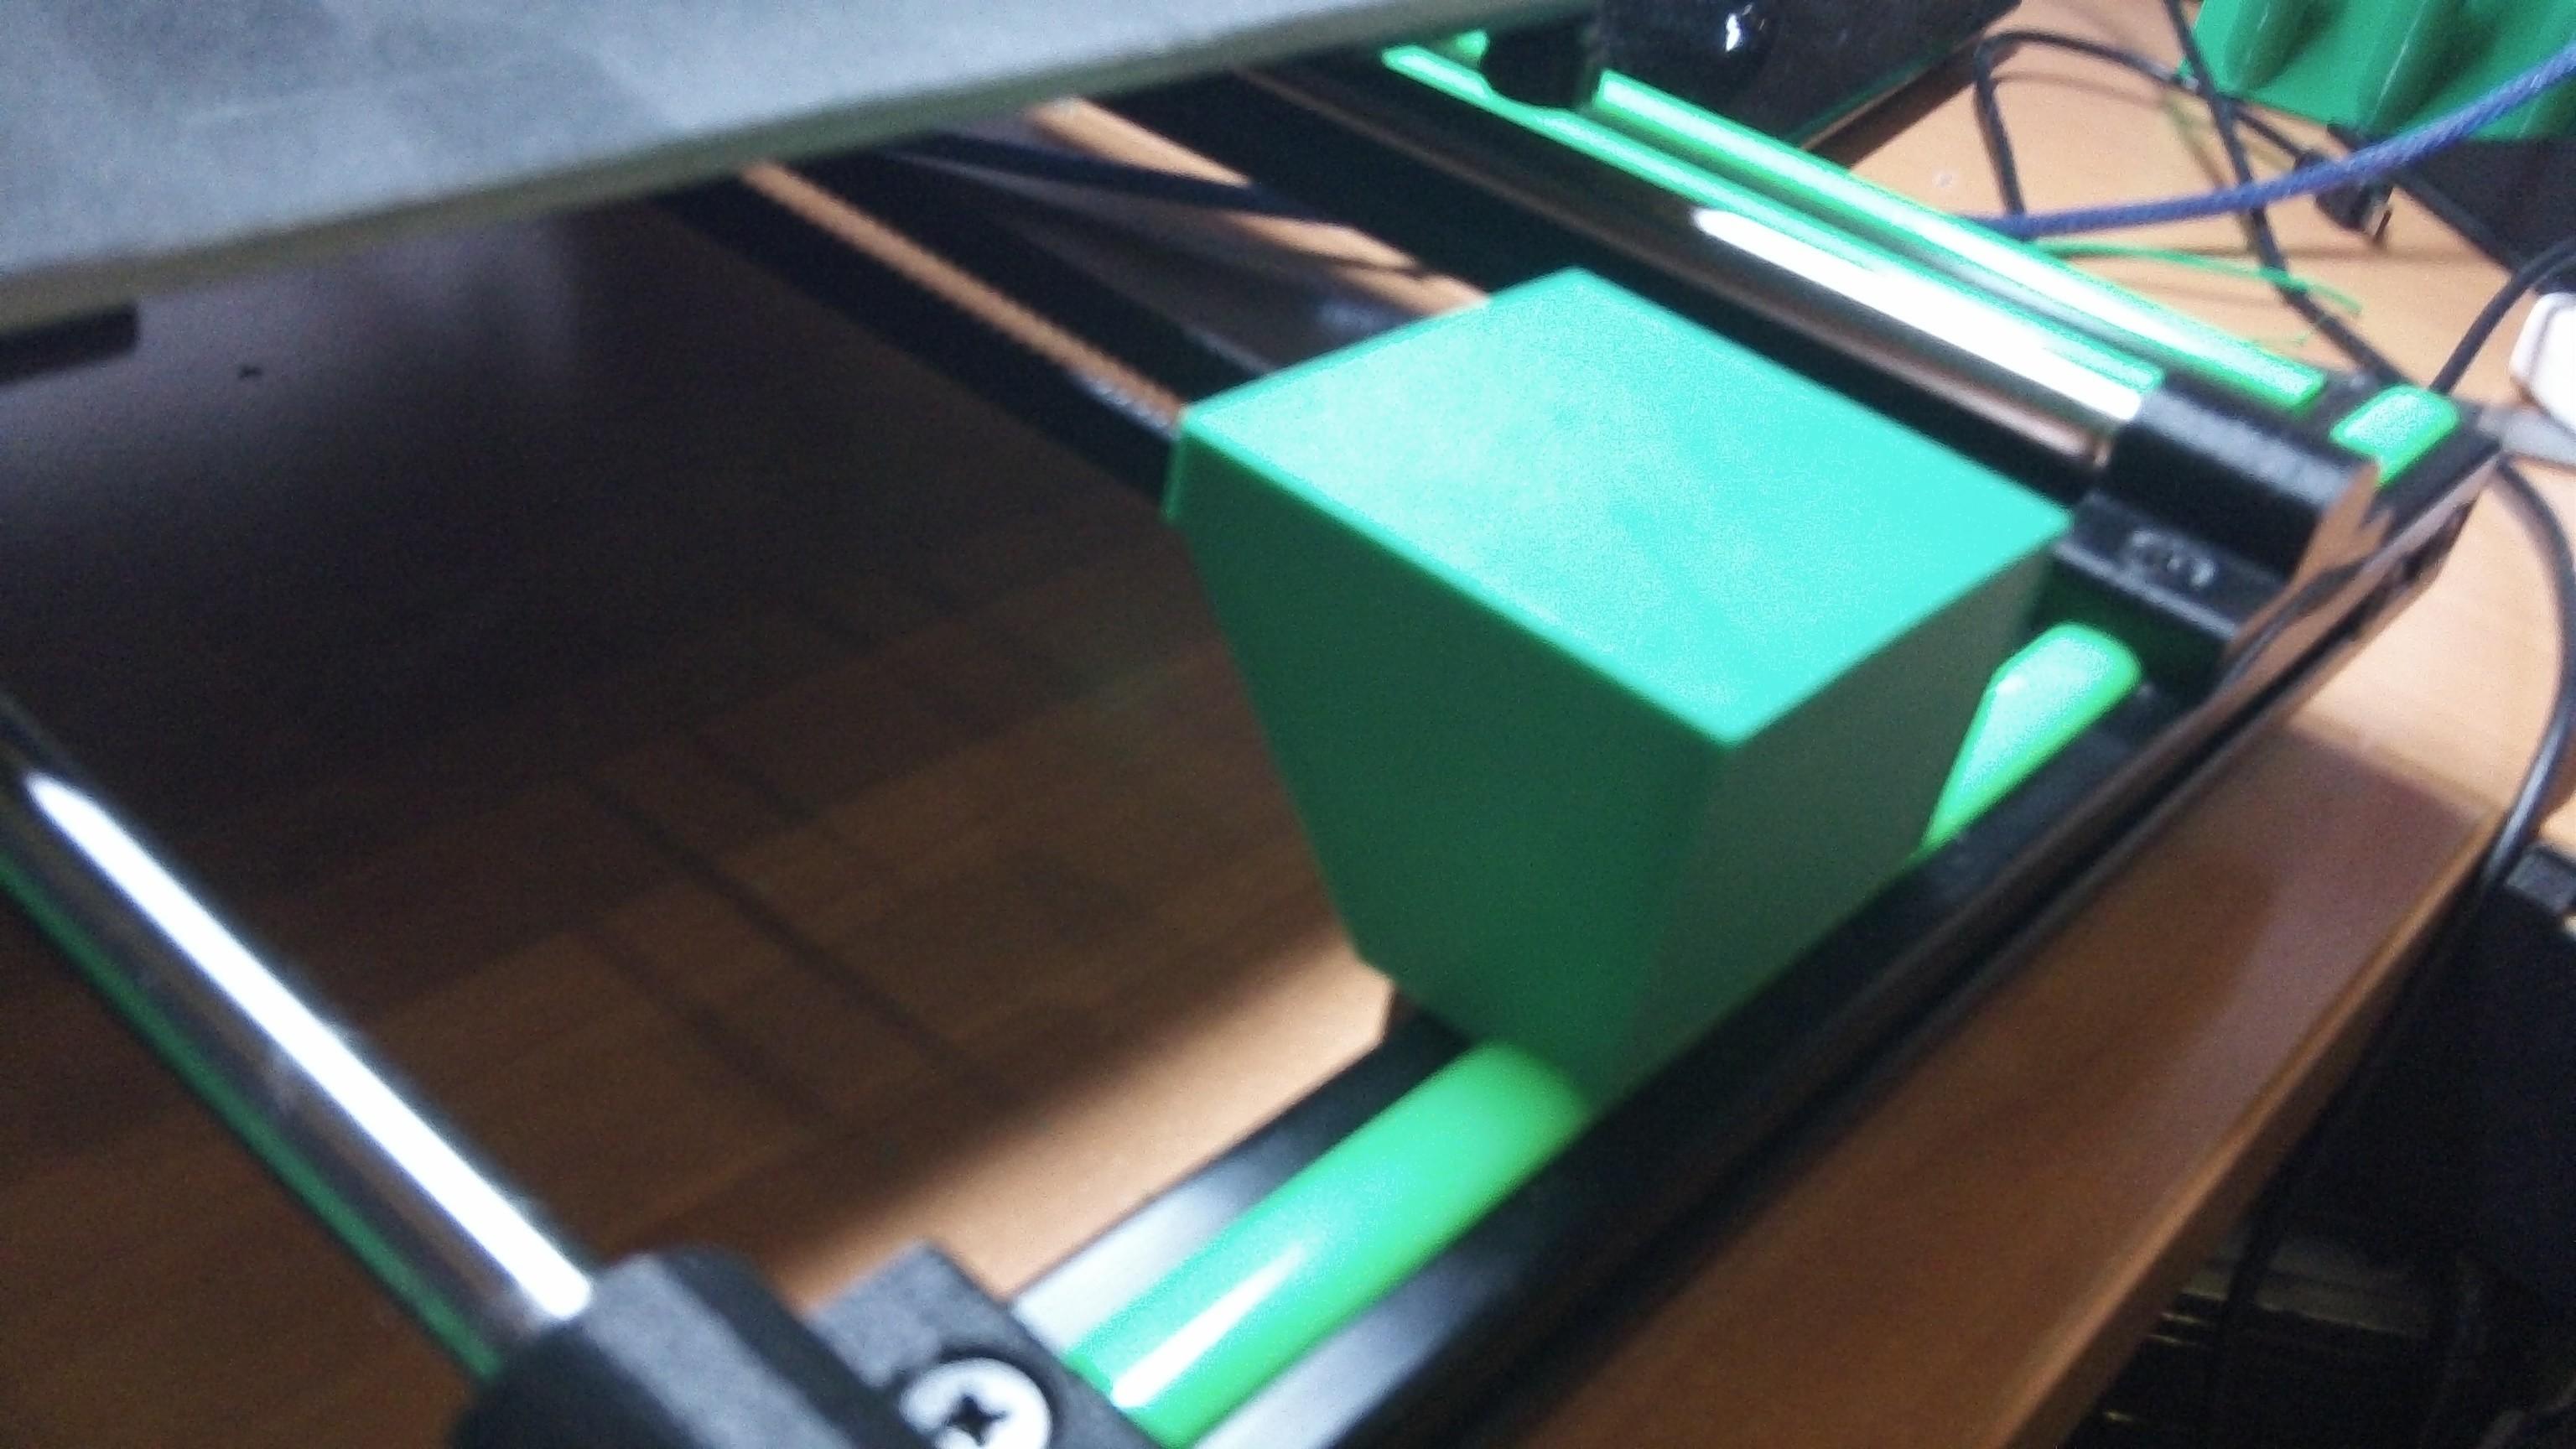 103_0545.JPG Download free STL file hood axis_y anet_E10 • 3D printable design, plok21